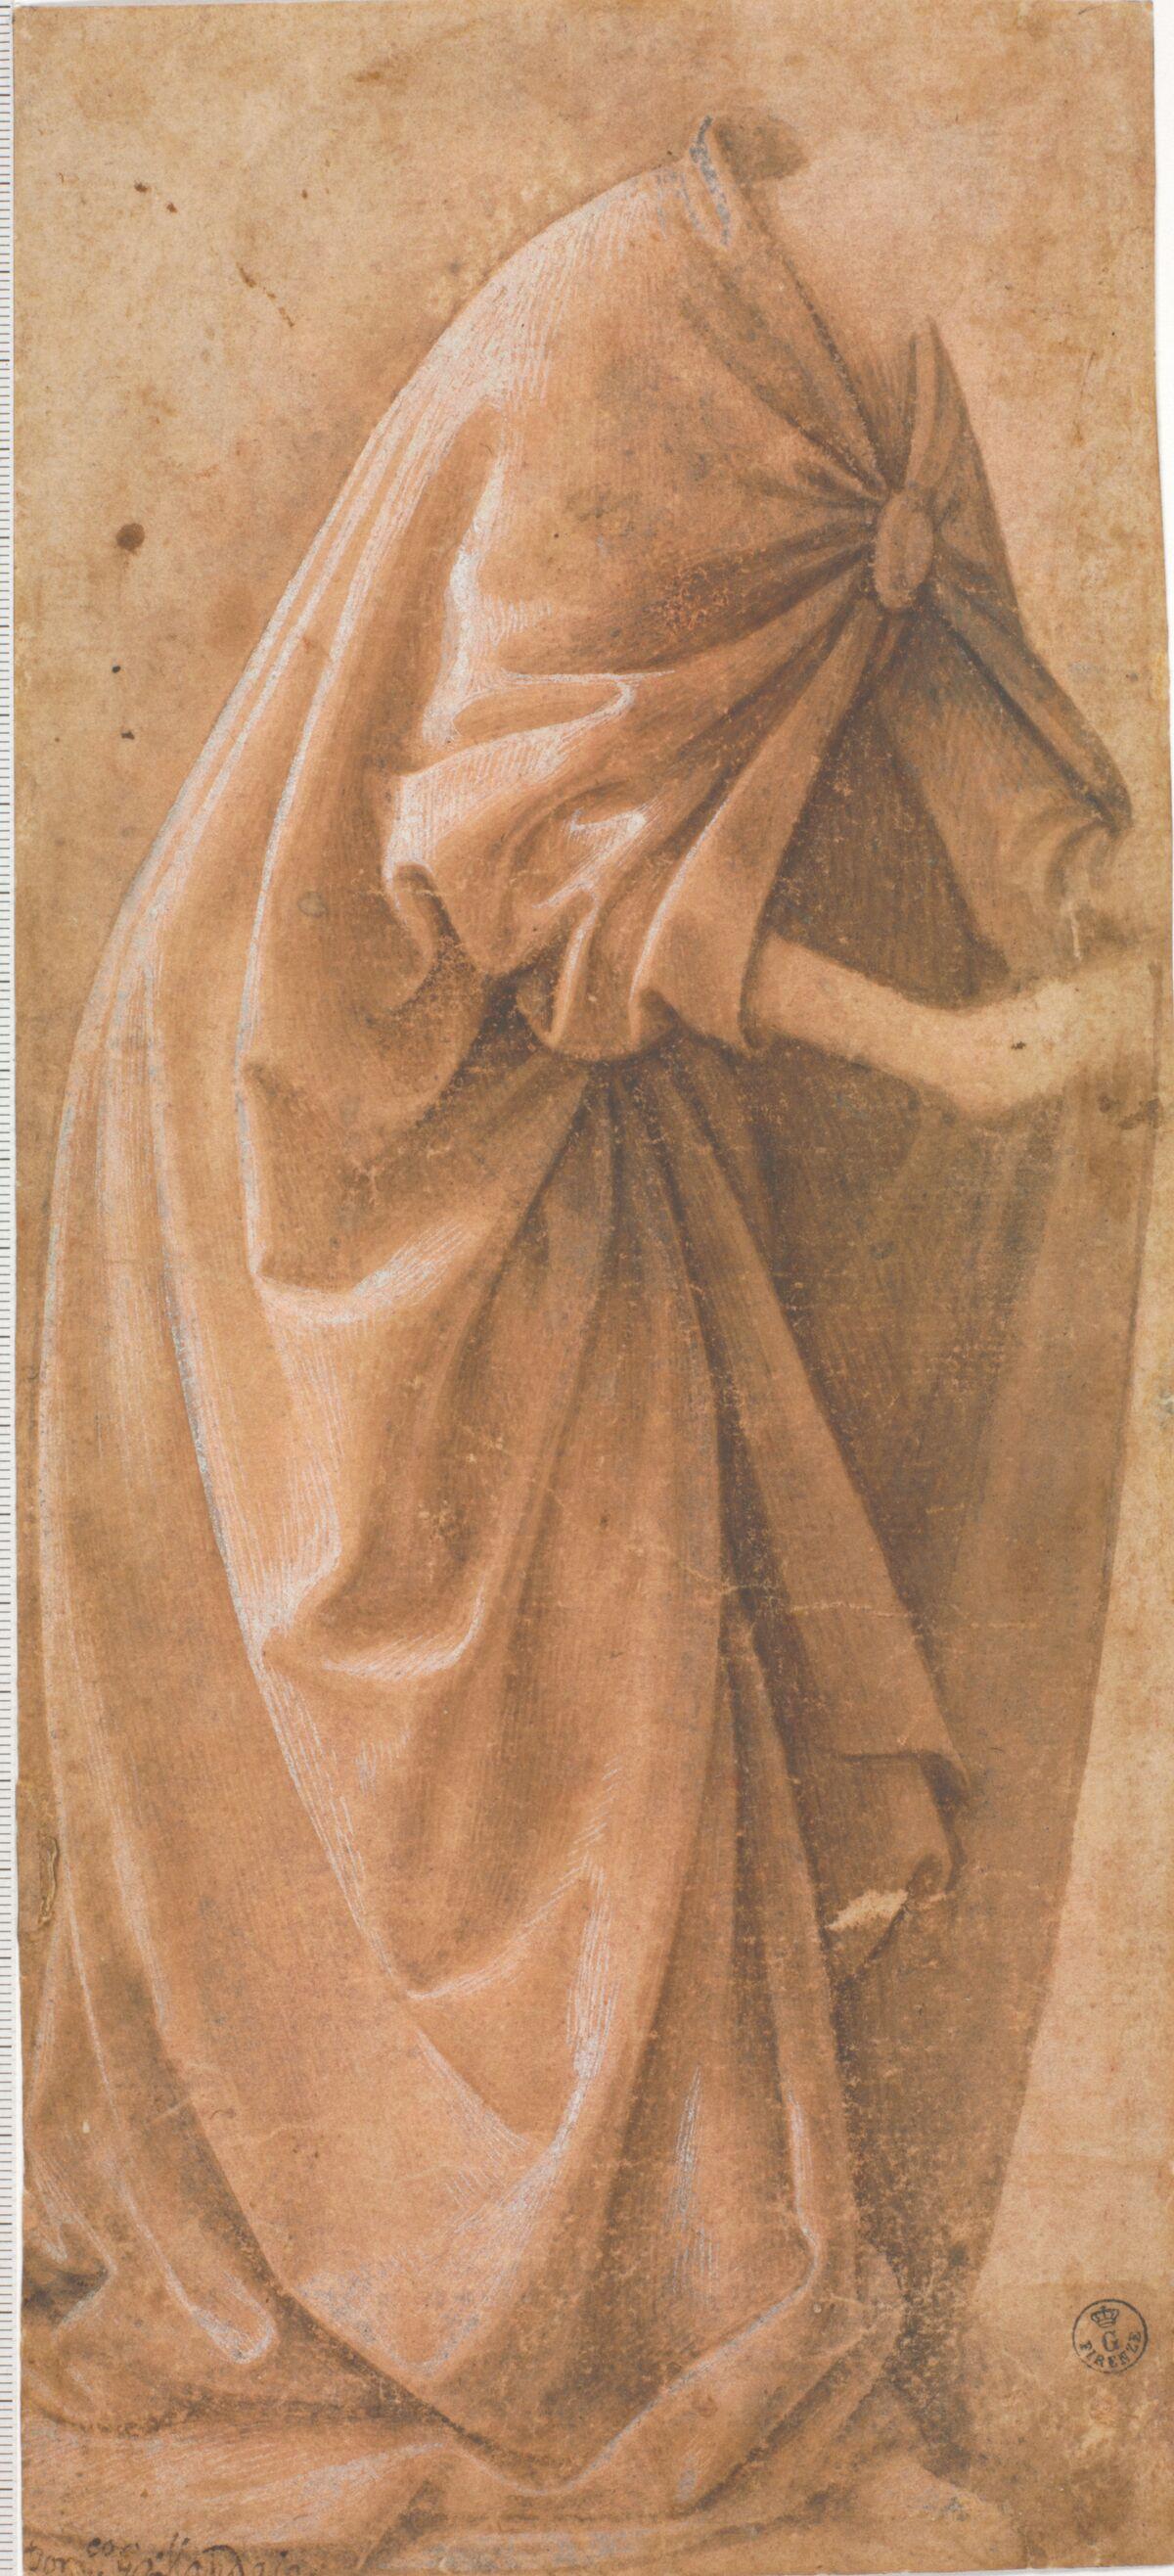 Domenico Ghirlandaio, Drapery study of a standing figure, 1485-90. Courtesy of the Metropolitan Museum of Art.